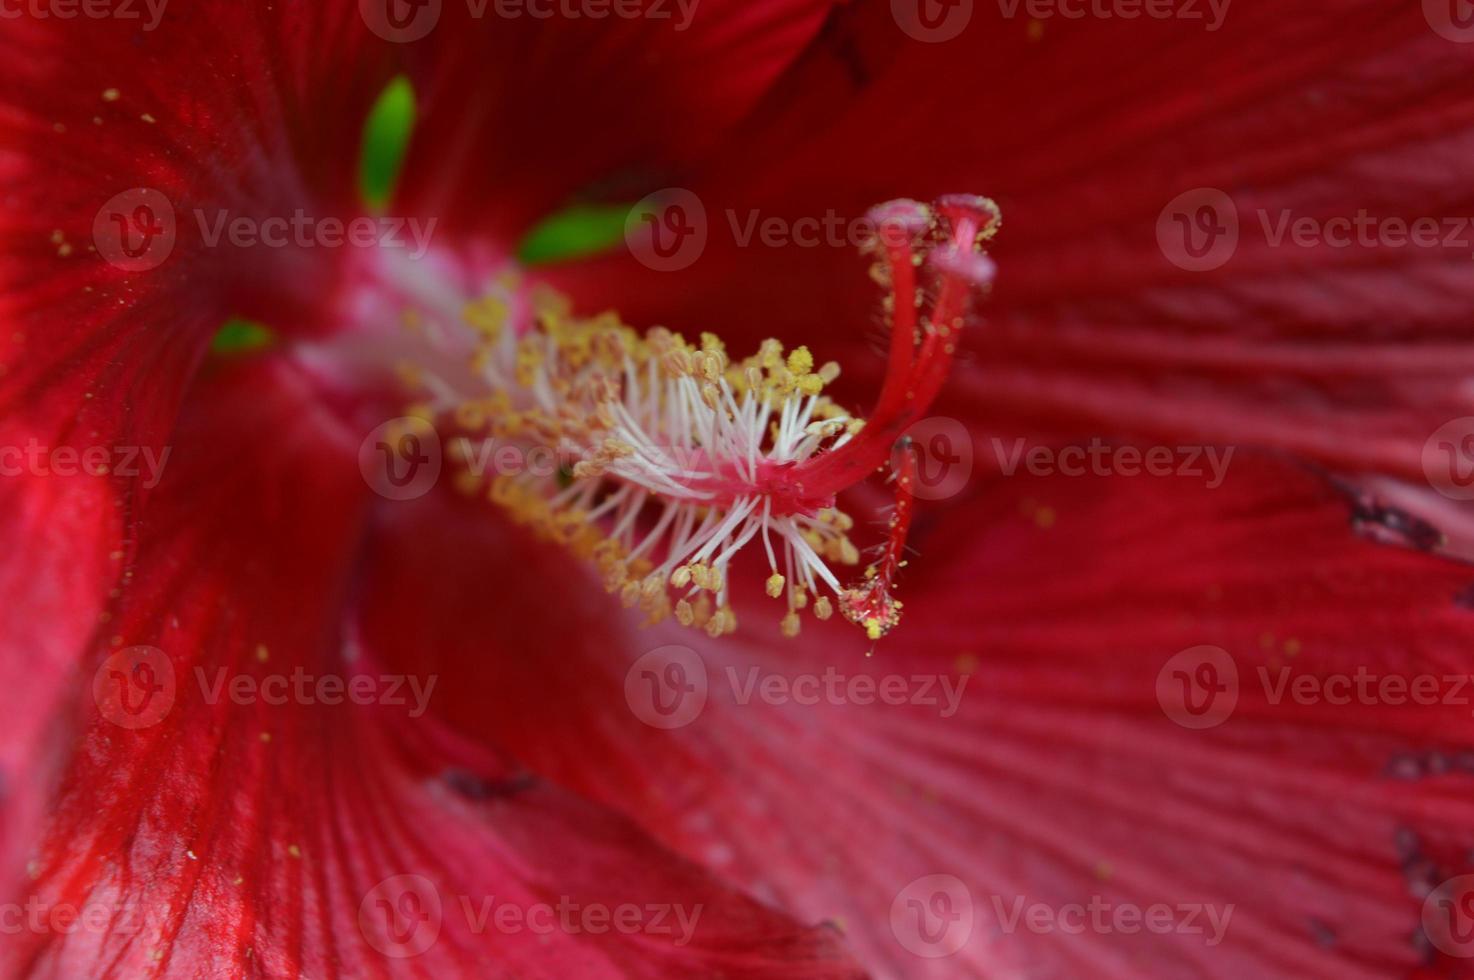 rode bloemclose-up foto